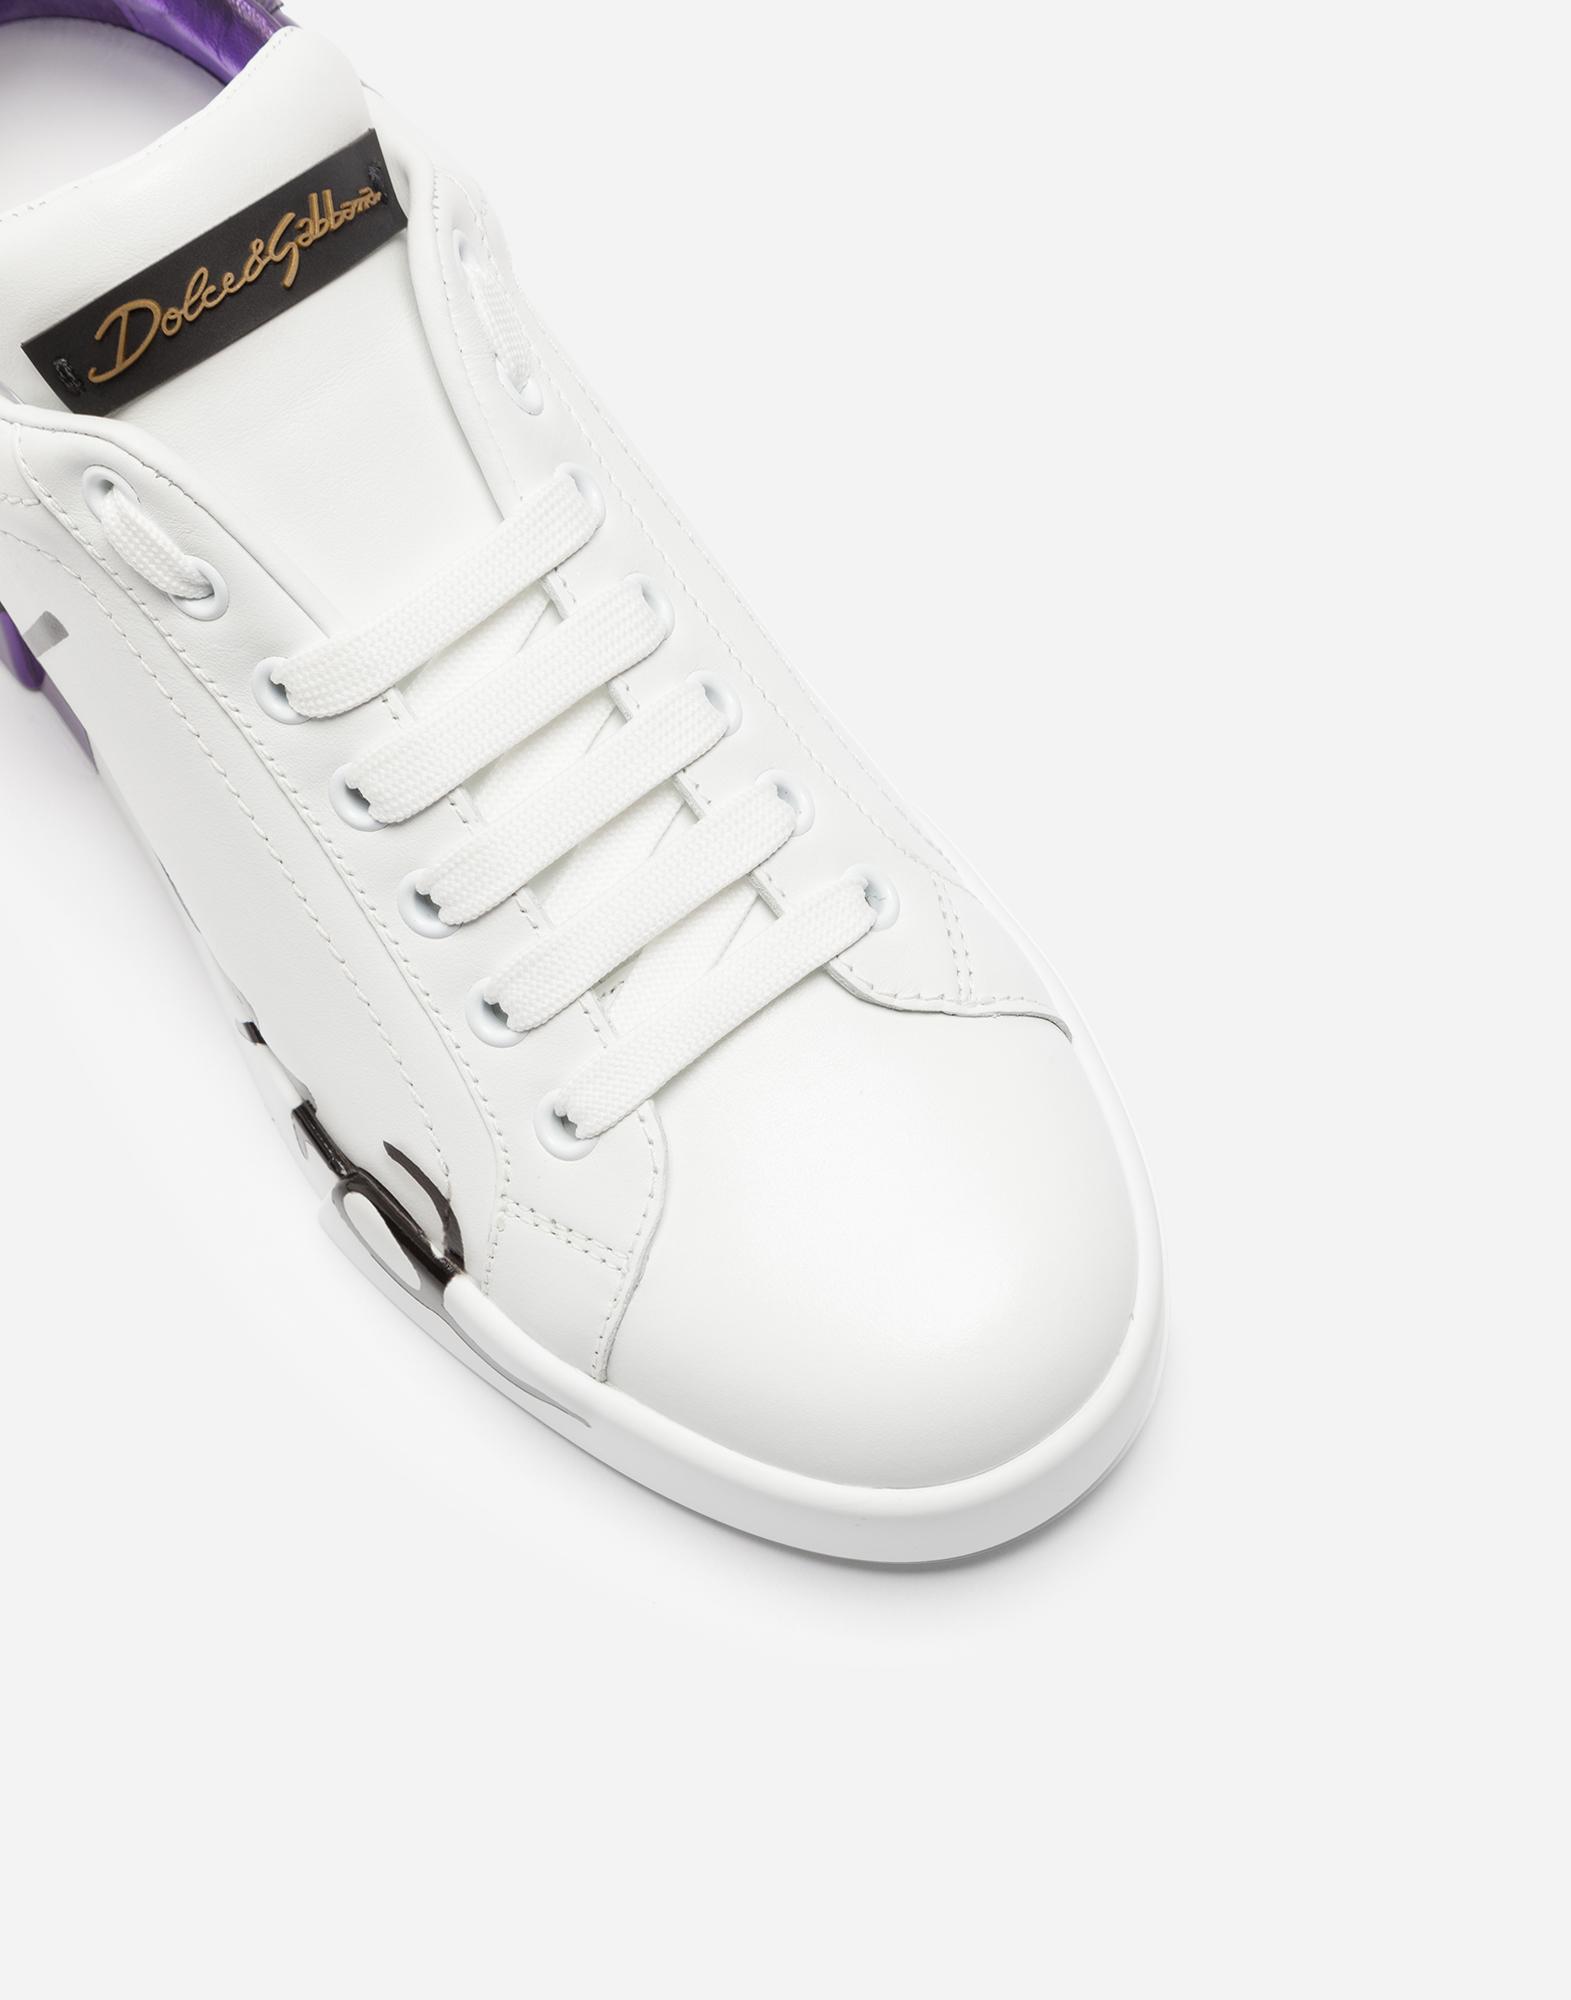 Dolce&Gabbana LEATHER PORTOFINO SNEAKERS WITH METALLIC HEEL